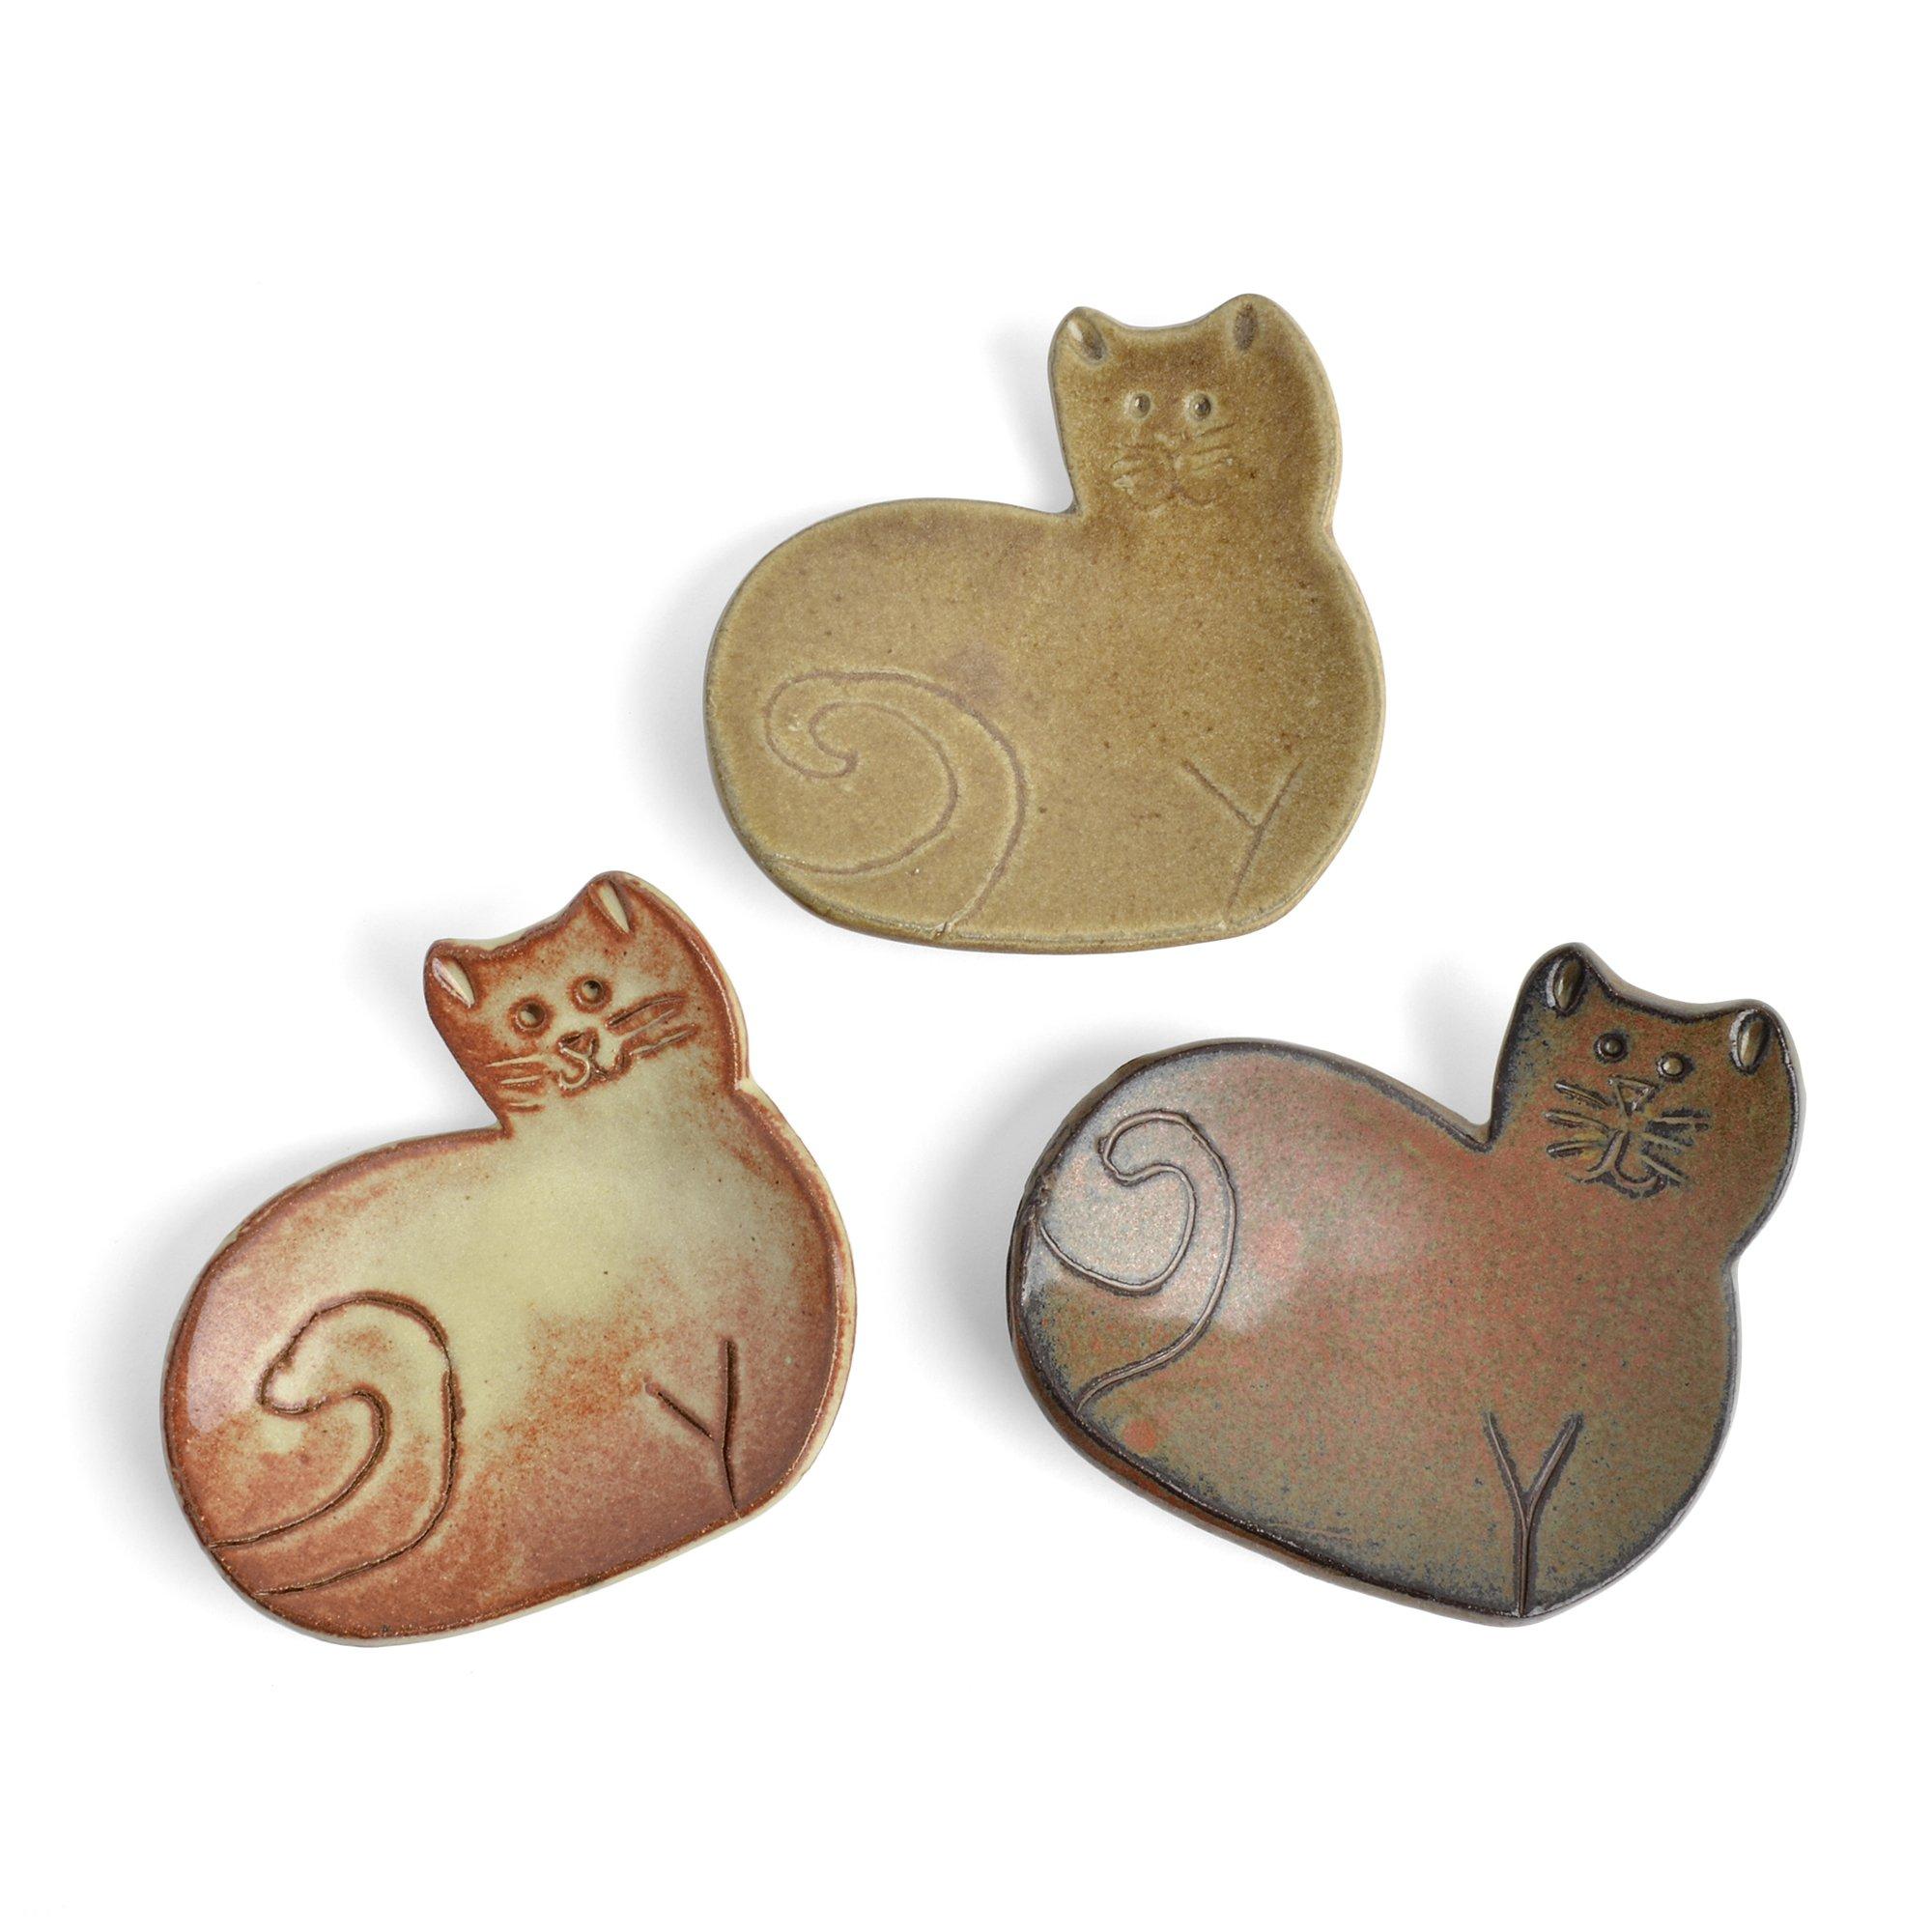 MudWorks Pottery Cat Tea Bag Coasters Trinket Plates, Set of 3